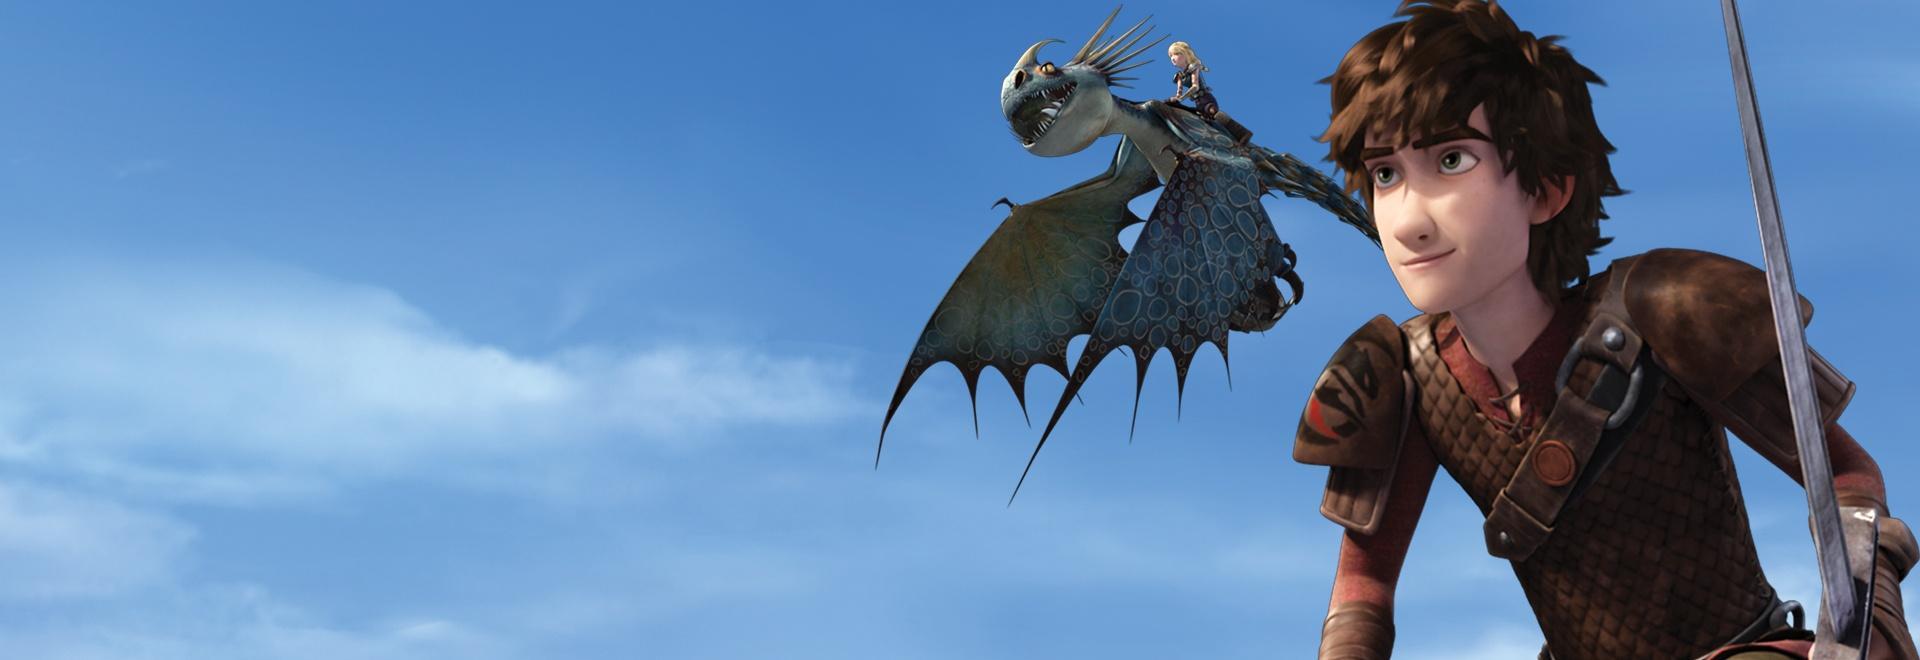 Dragons: Oltre i confini di Berk